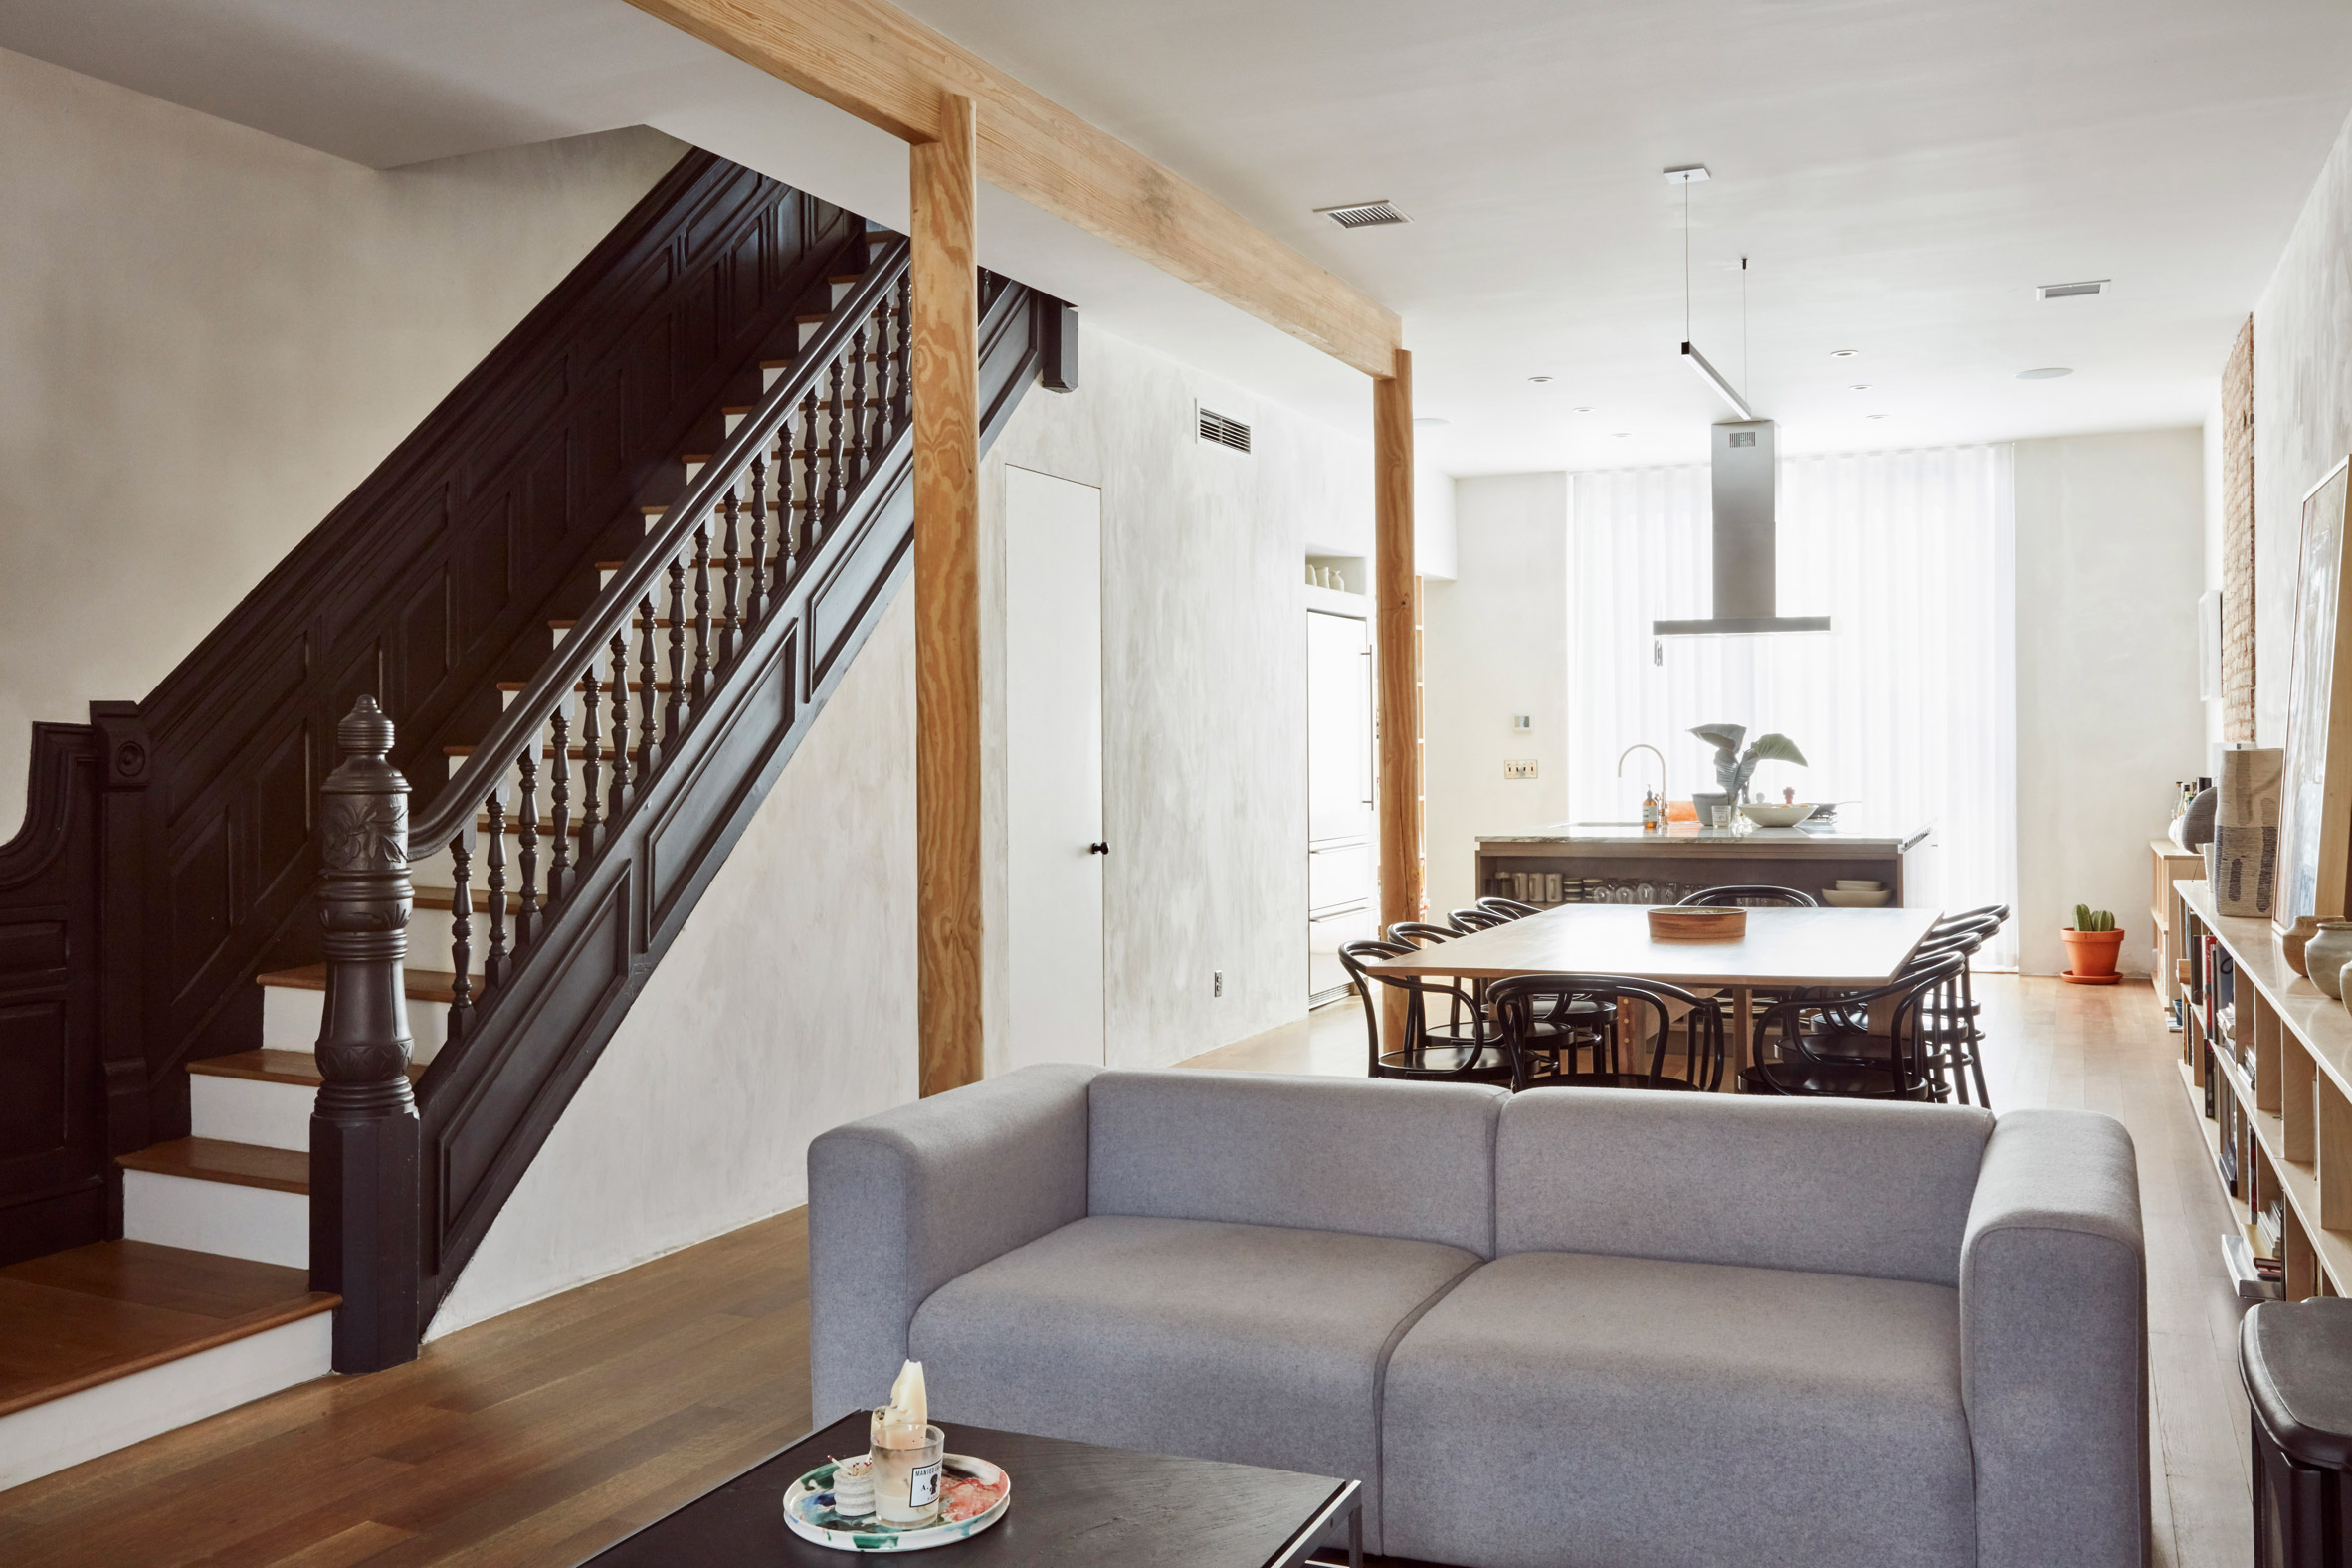 Lauren Snyder and Keith Burns create home inside overhauled brownstone in Brooklyn